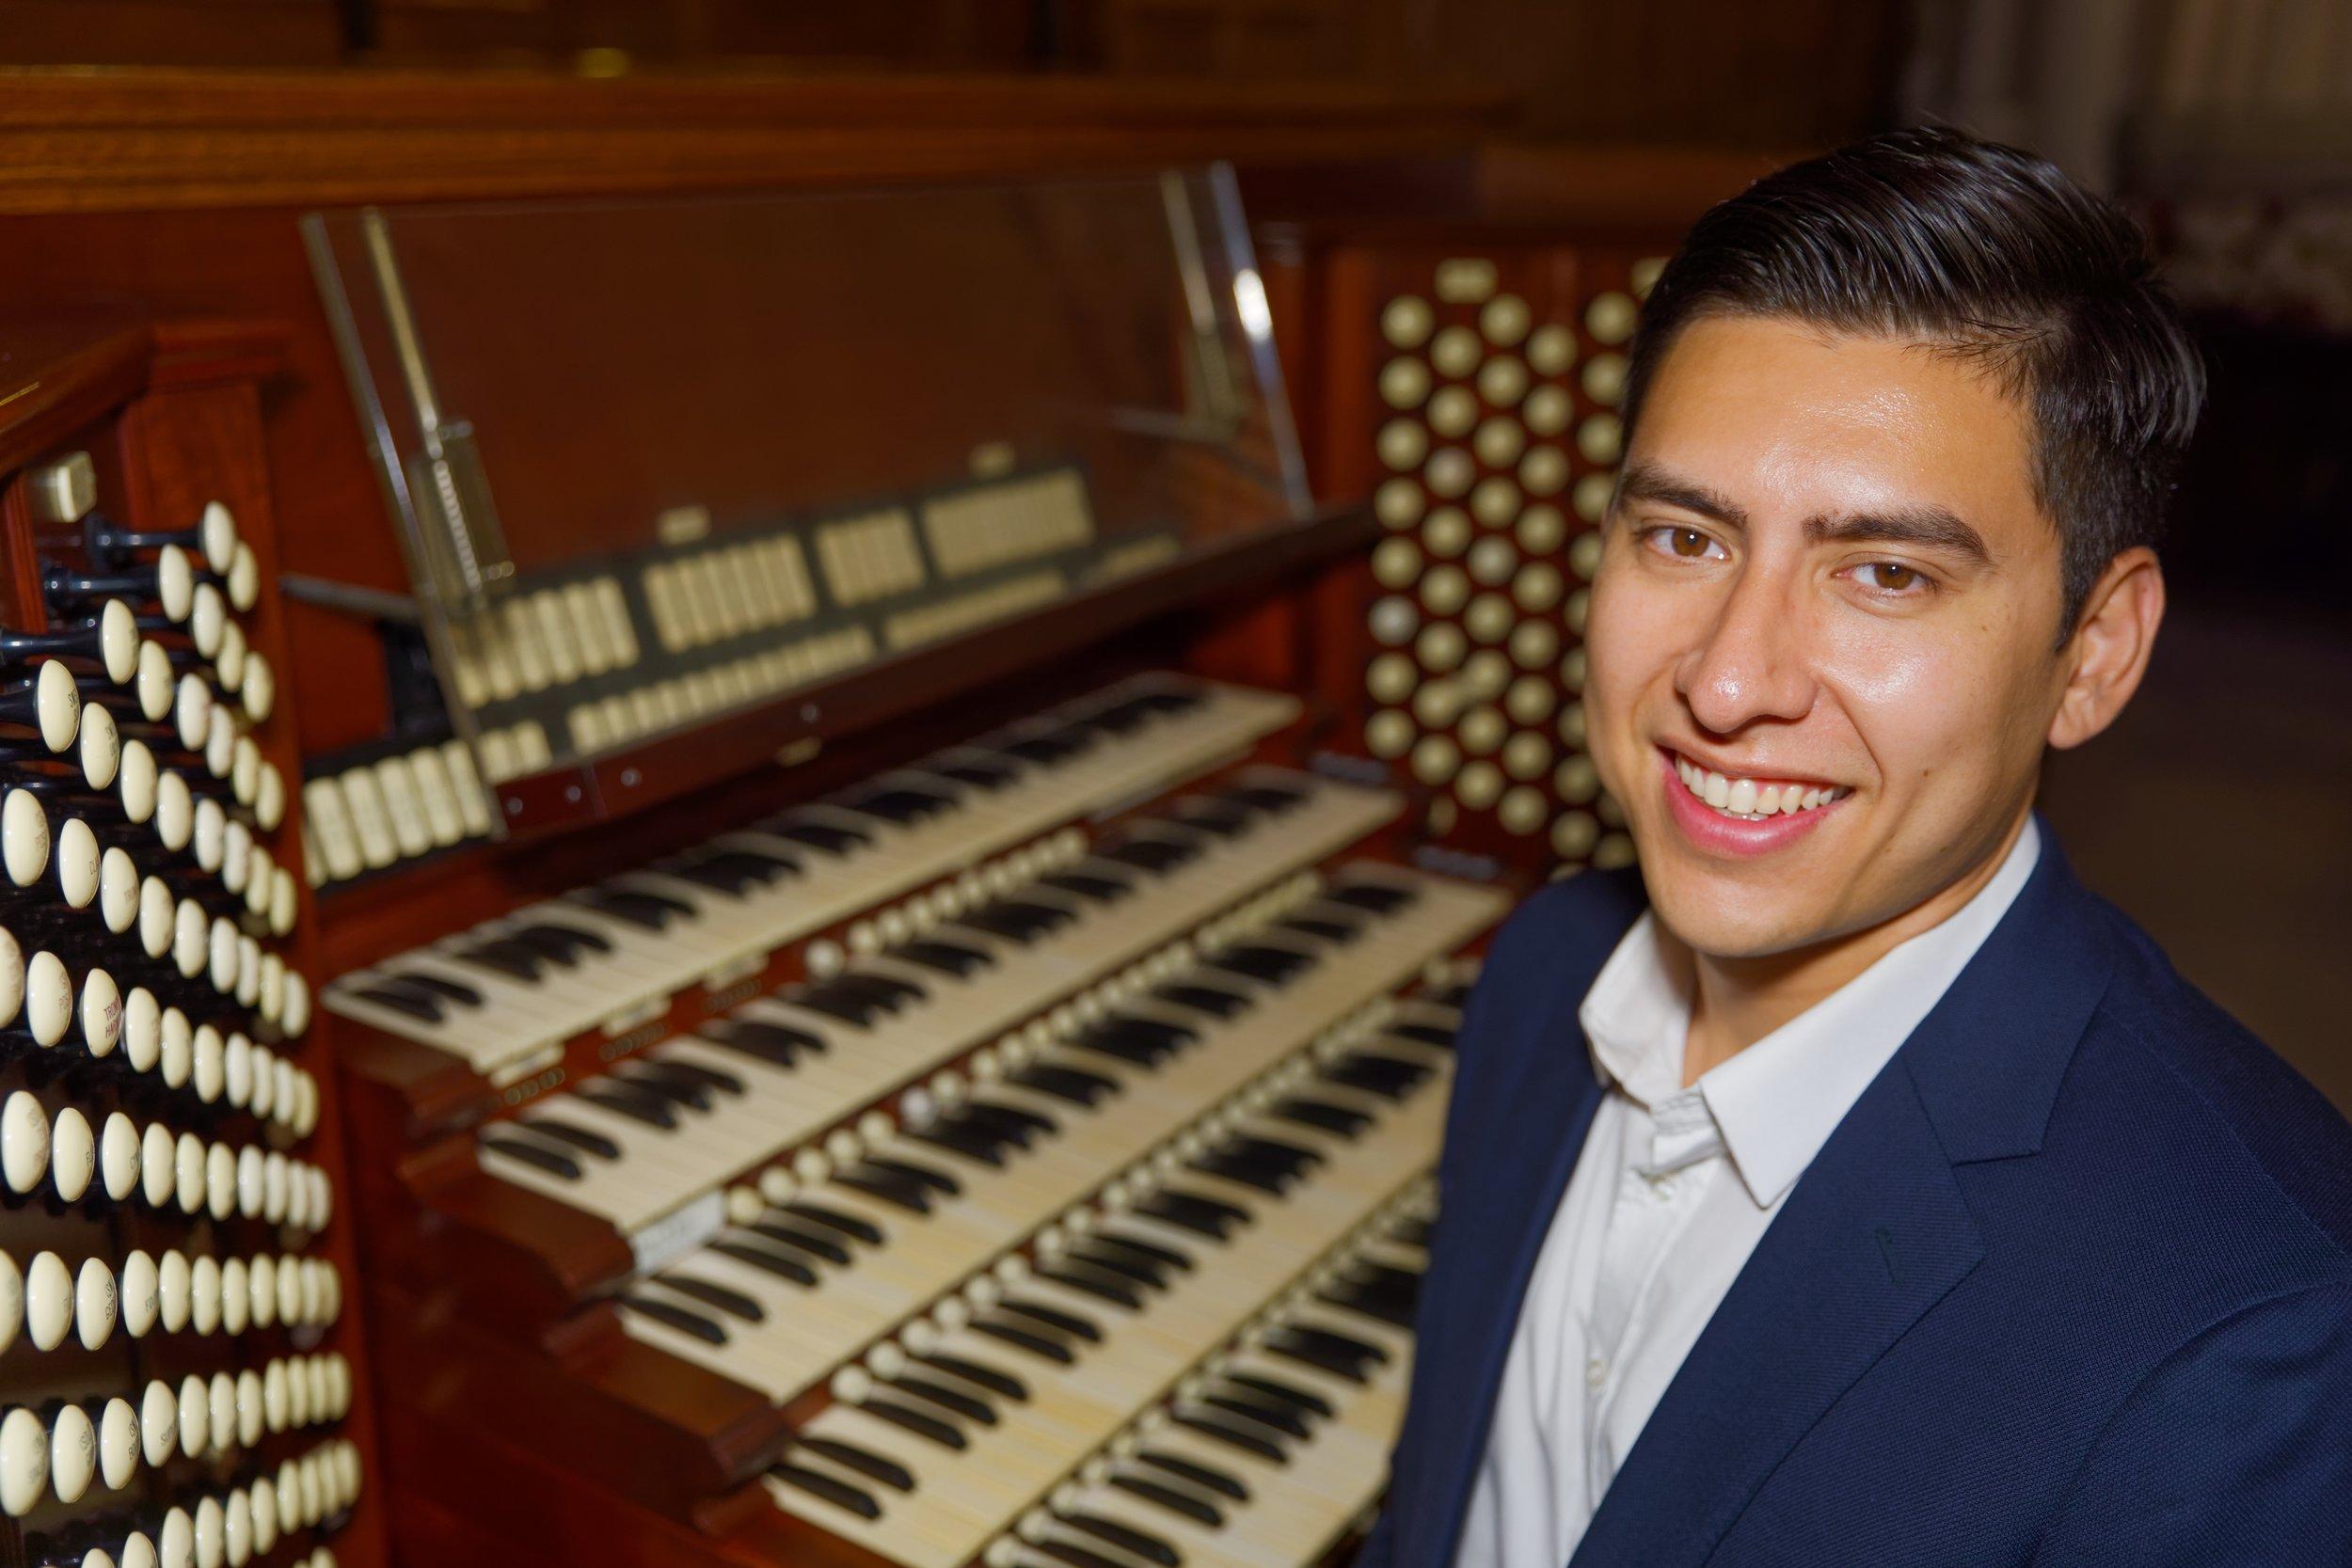 Organist Michael Hey